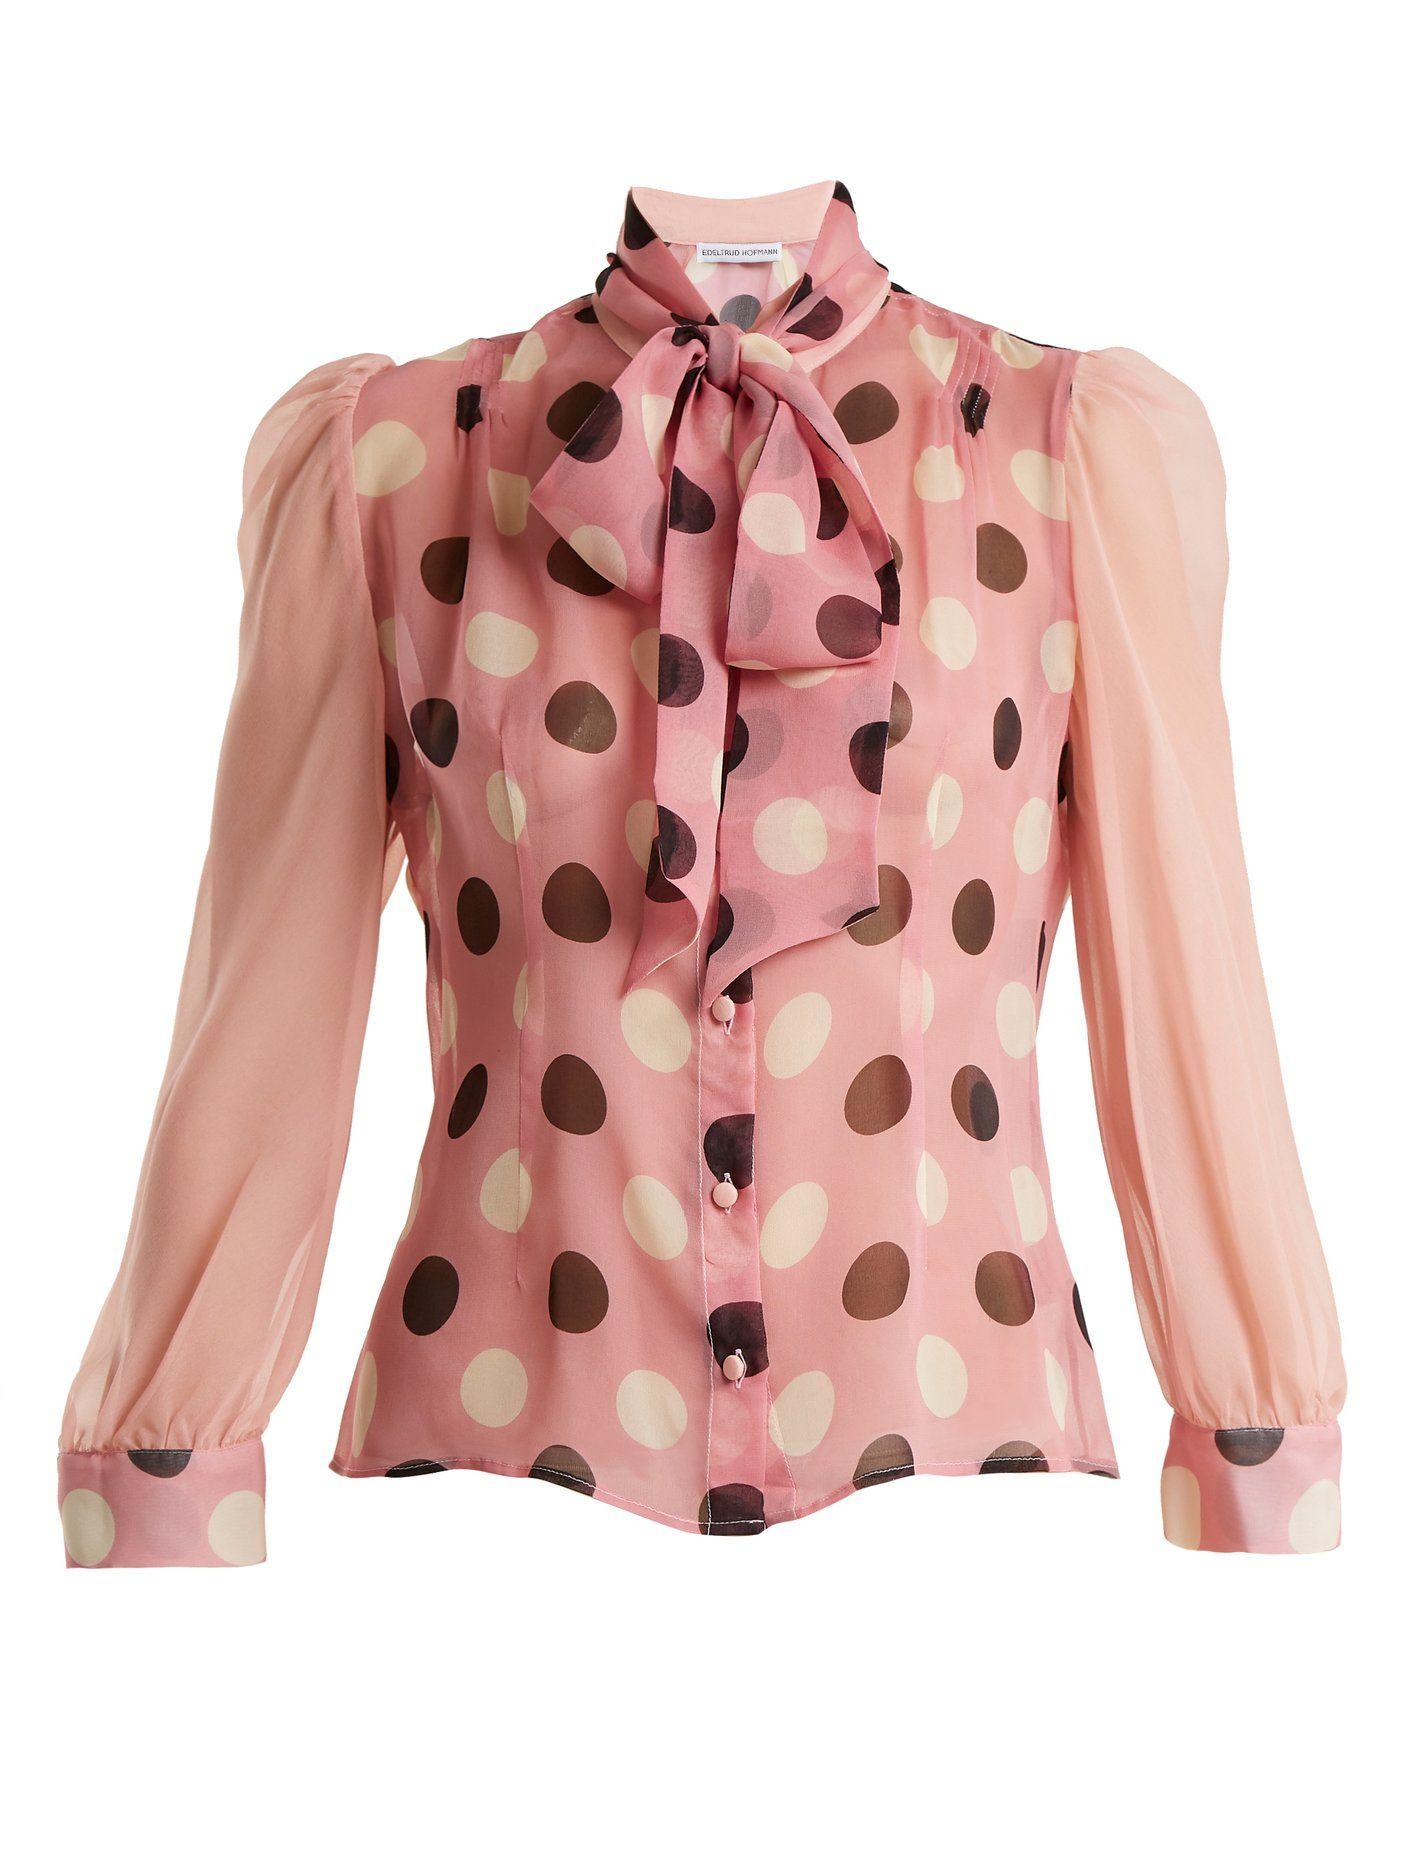 dc819dfe9da6c Click here to buy Edeltrud Hofmann Pussy-bow polka-dot silk blouse at  MATCHESFASHION